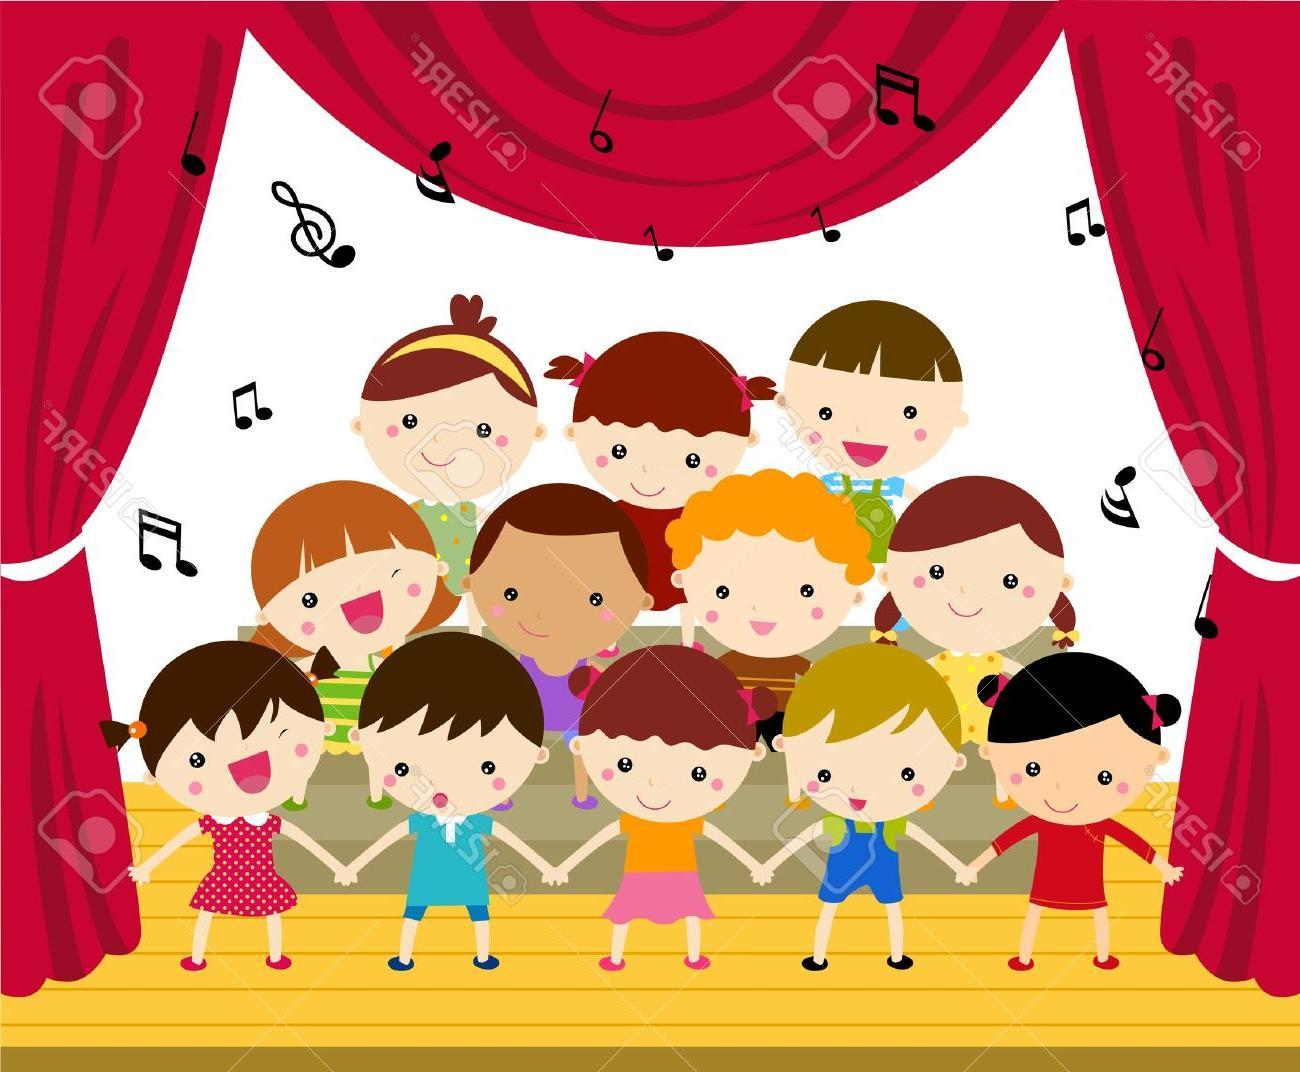 Choir clipart child choir. Unique concert band and